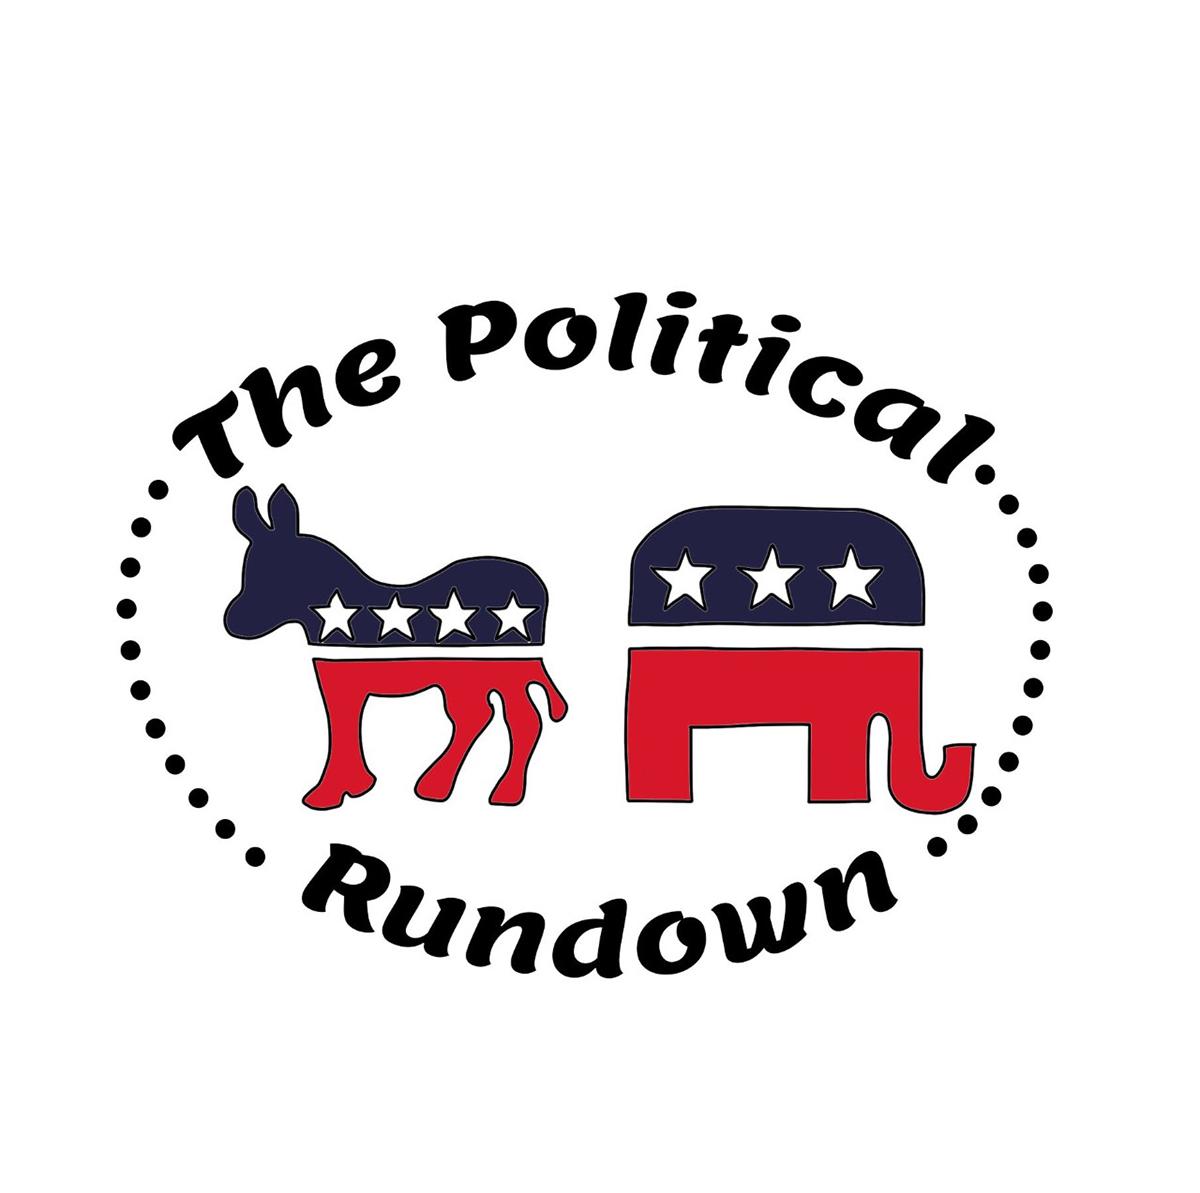 Major Takeaways from the September Democratic Presidential Debate